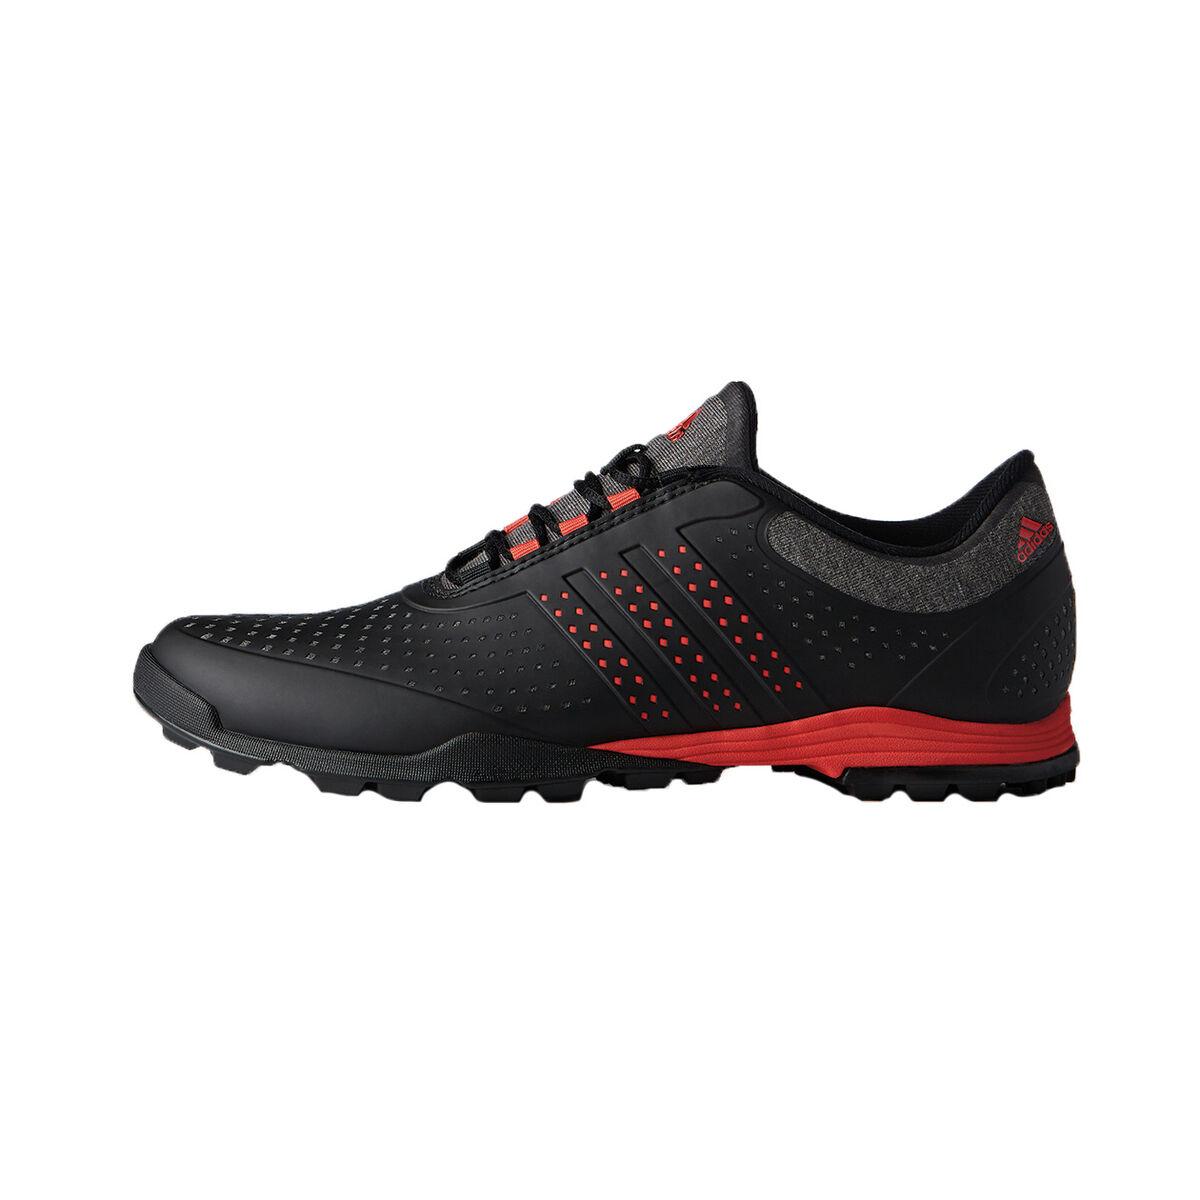 3b4a013f8c2042 adidas adiPure Sport Women s Golf Shoe - Black Red